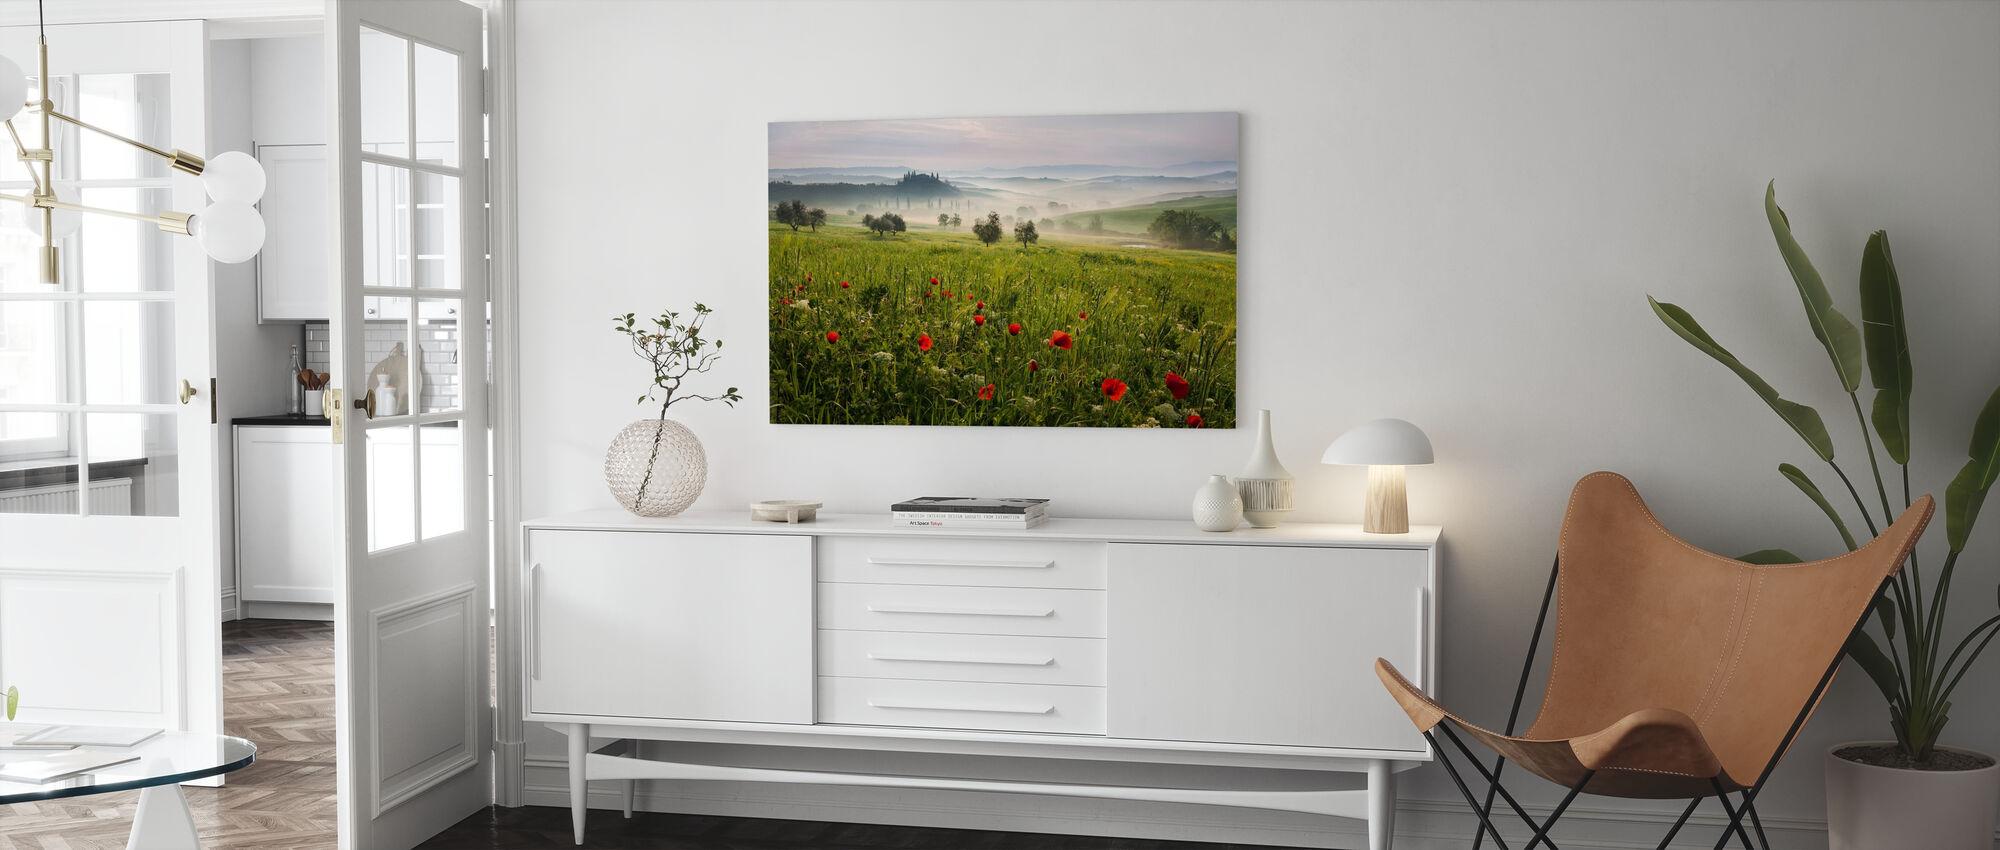 Toskanska våren - Canvastavla - Vardagsrum